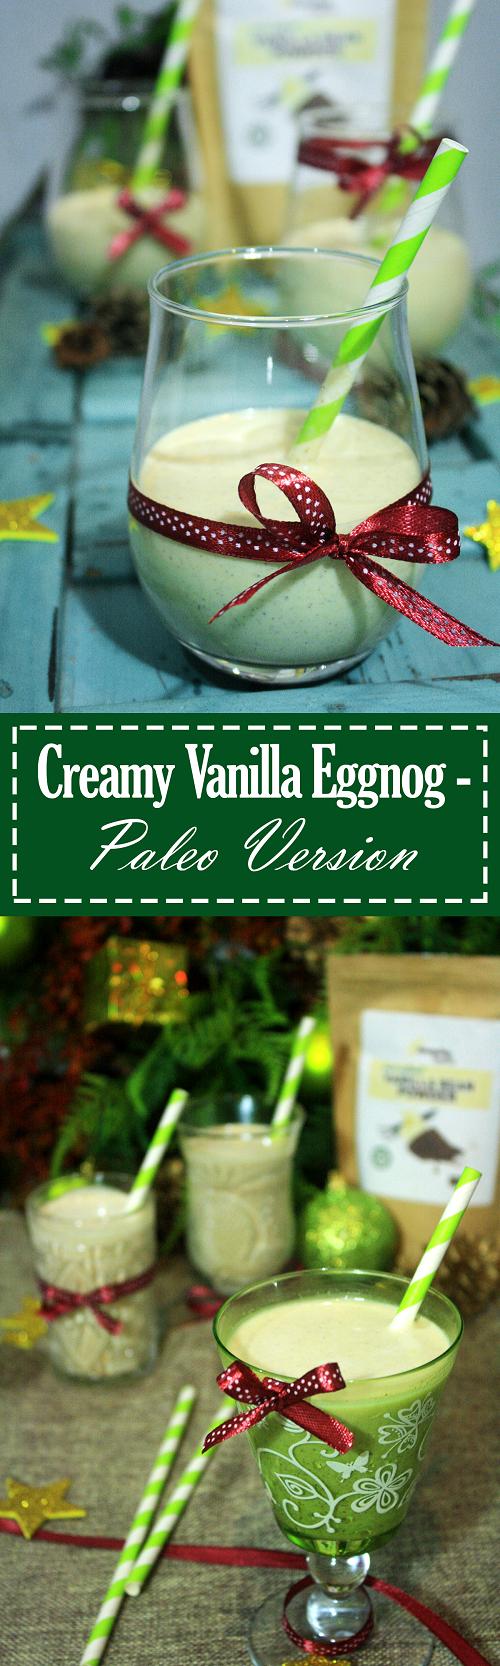 Creamy Paleo Vanilla Eggnog Recipe - Summer Day Naturals